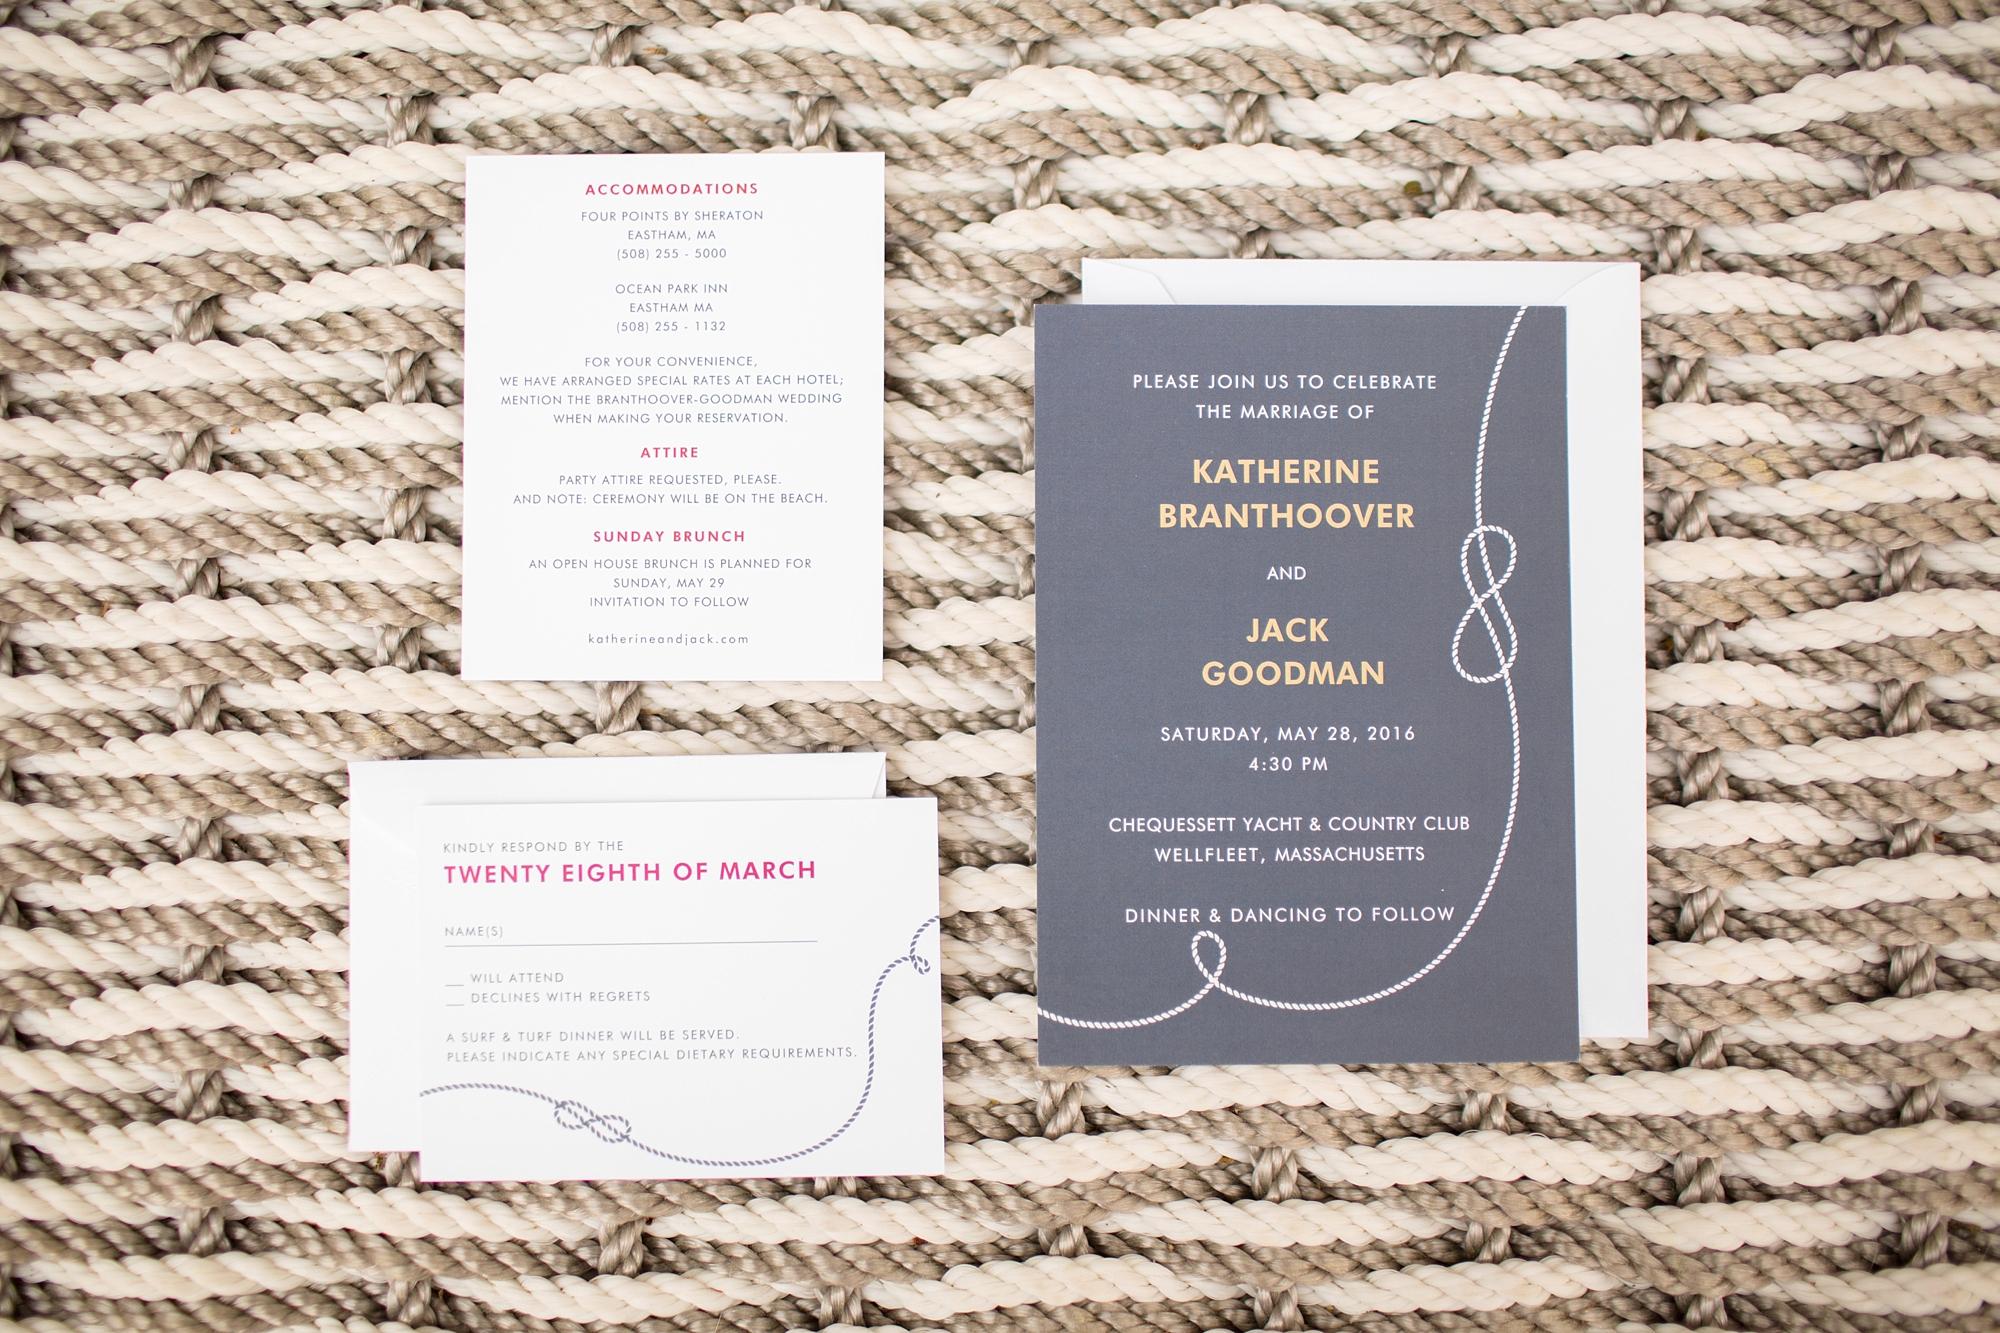 Goodman 1-Getting Ready-26_anna grace photography wellfleet cape cod massachusetts destination wedding photographer Chequessett Yacht and Country Club wedding photo.jpg